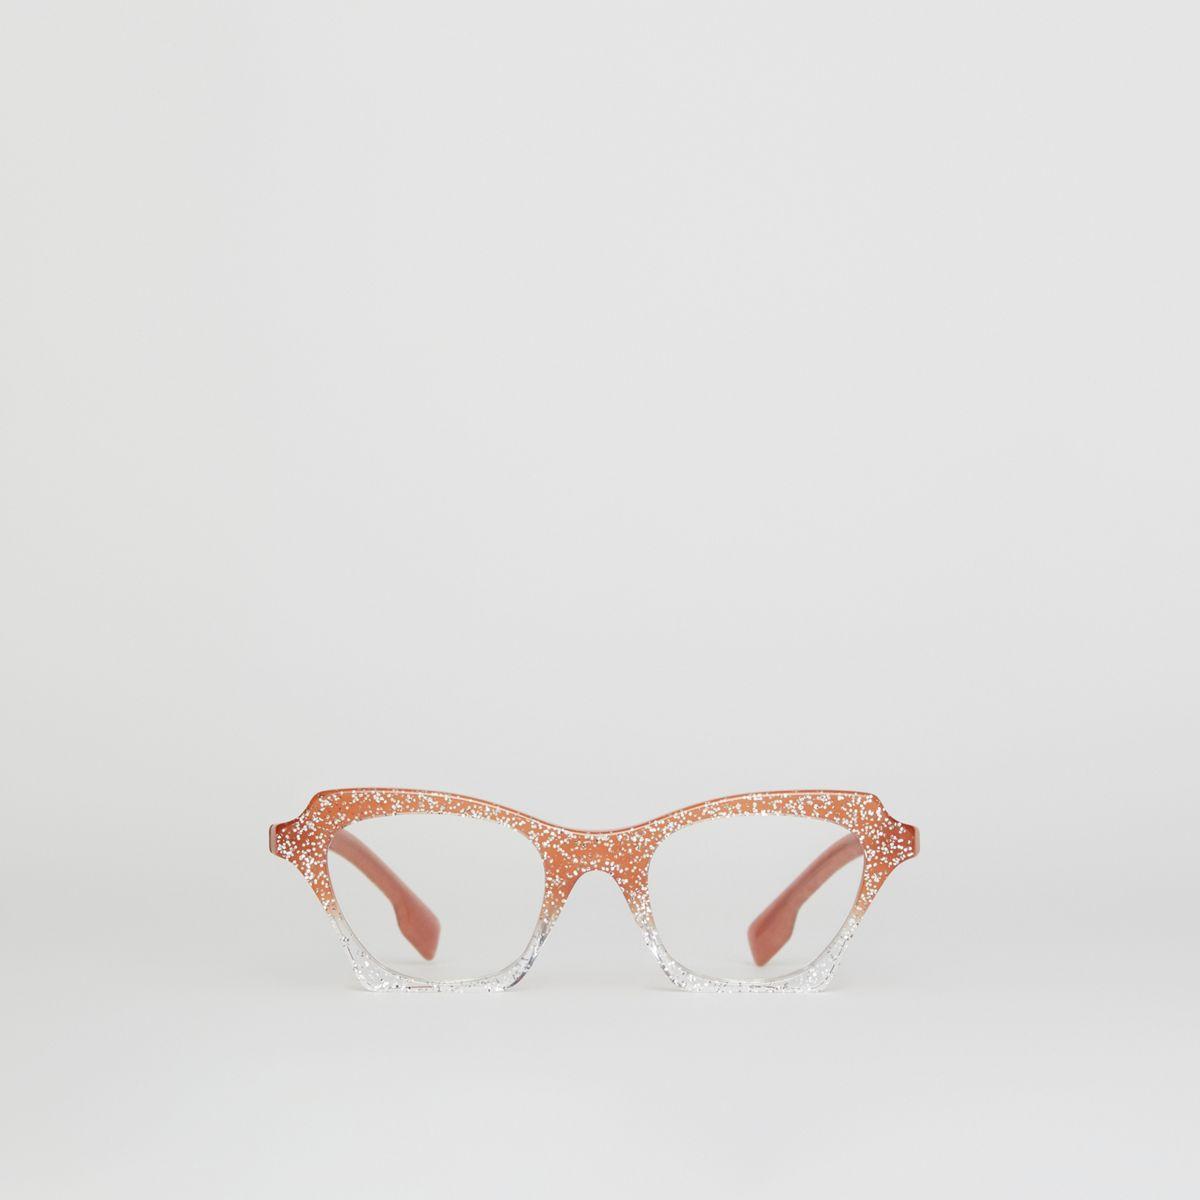 984b7265bc5 Burberry Glitter Detail Butterfly Optical Frames - Lyst